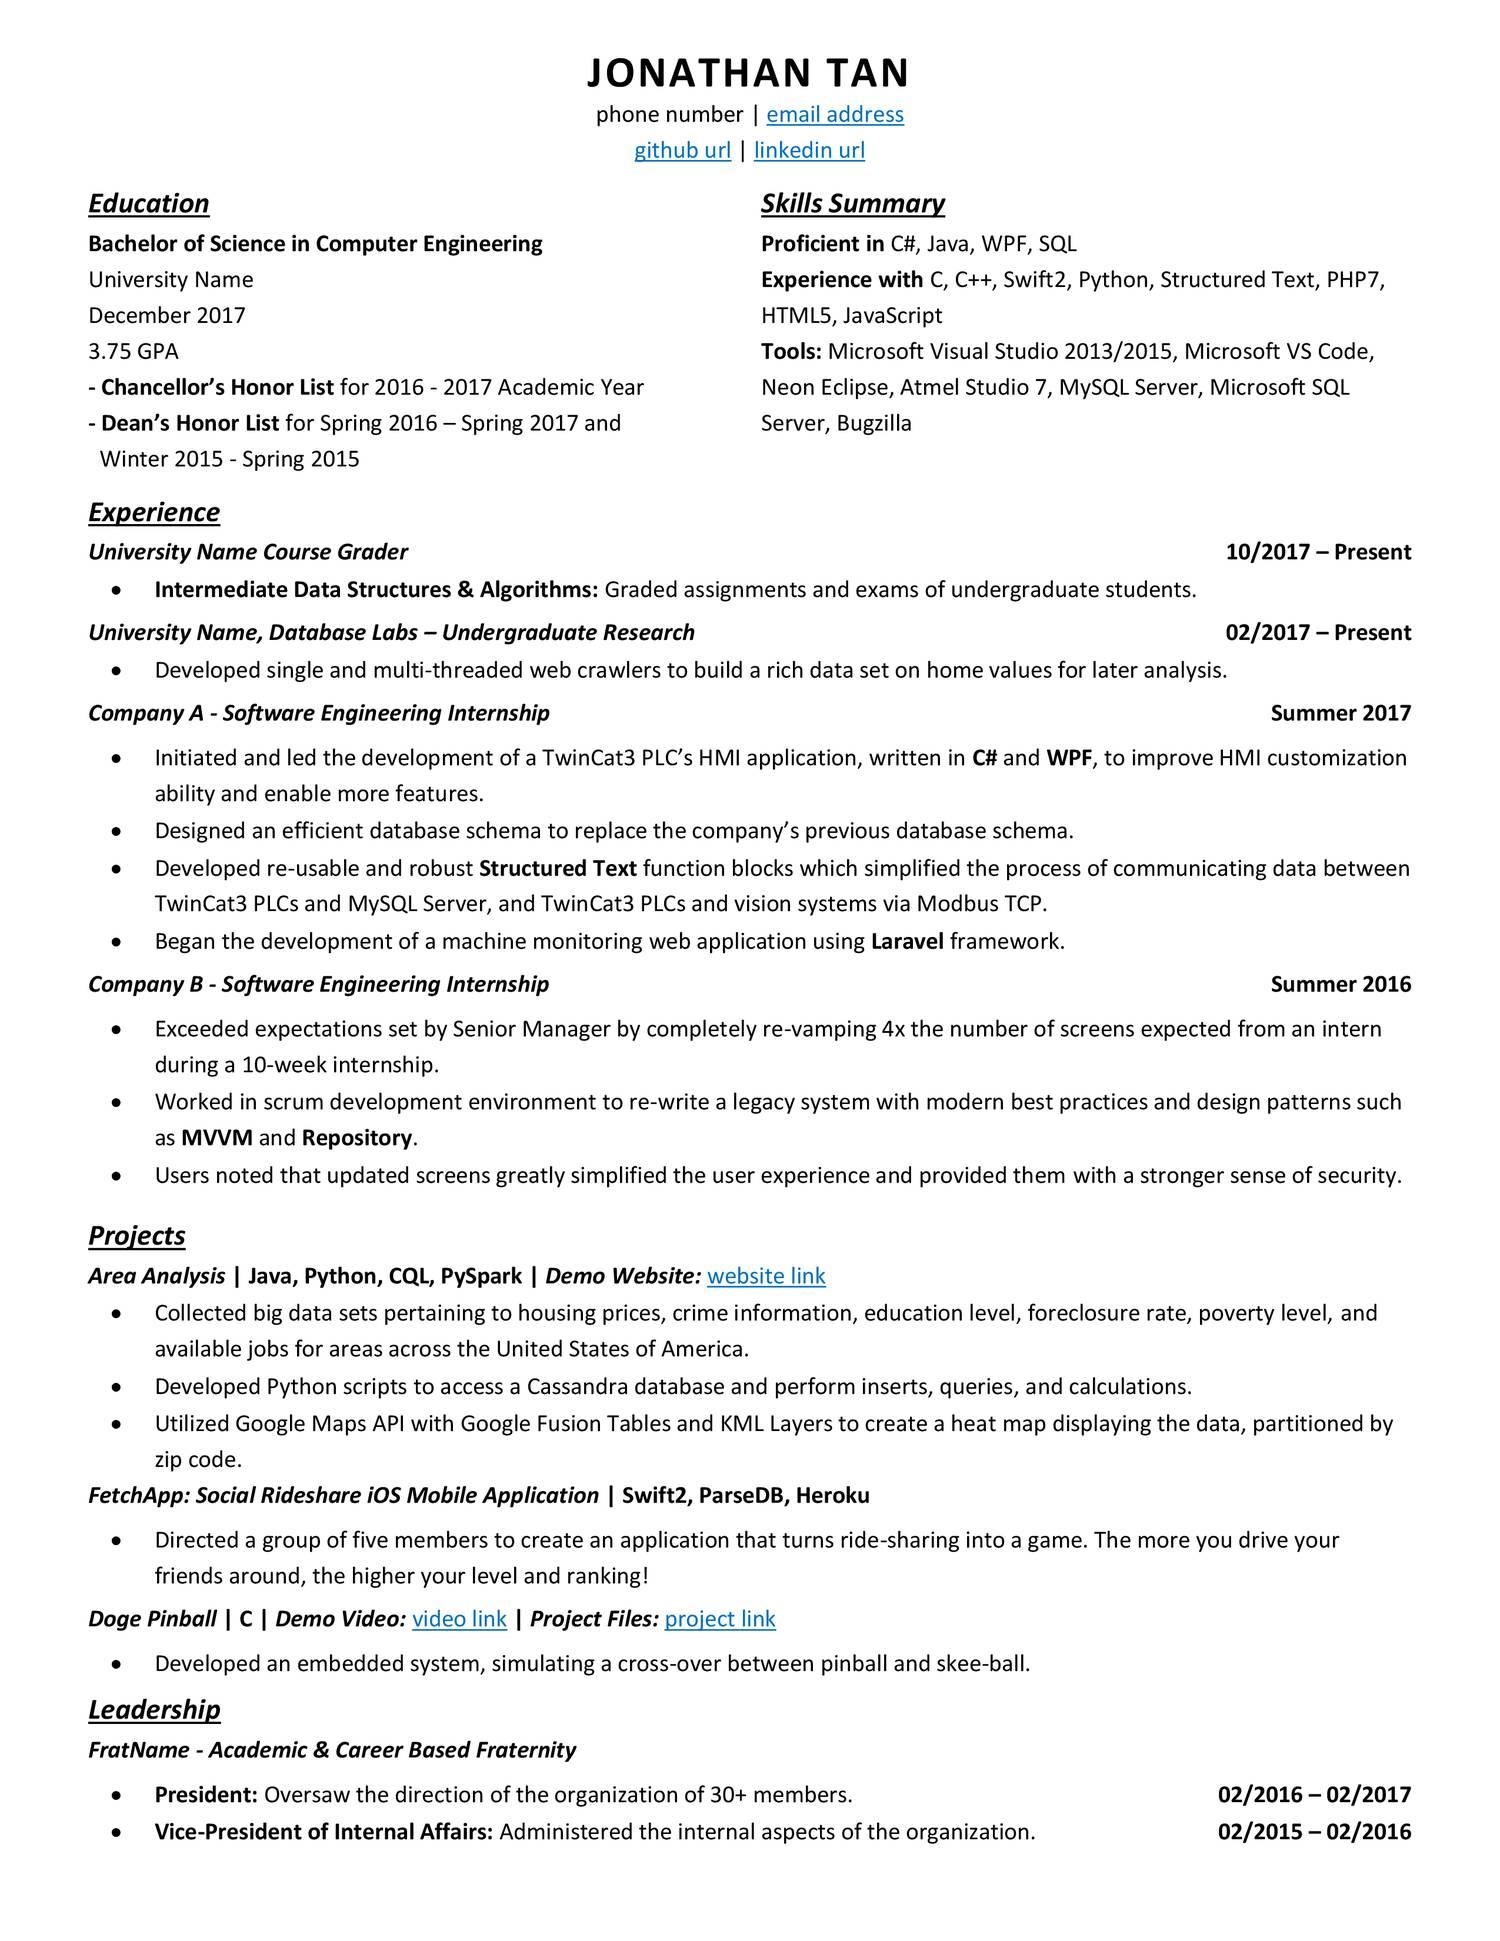 Senior Software Engineer Resume Reddit